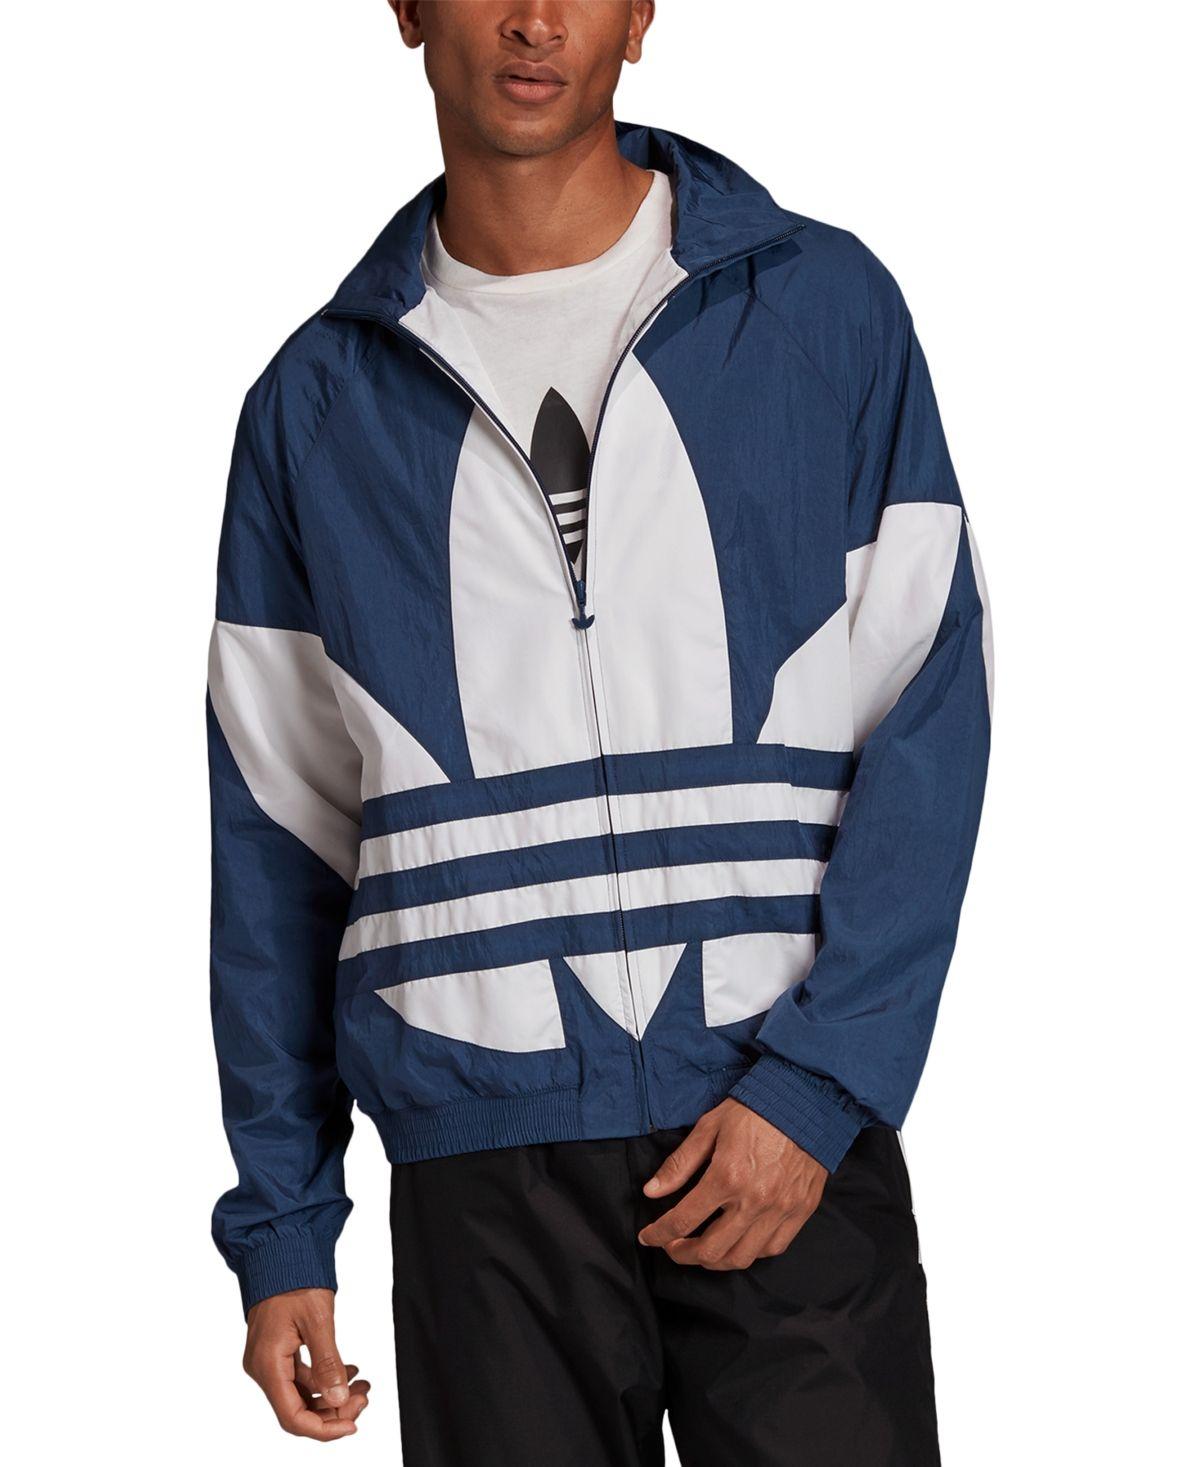 Adidas Men S Originals Big Logo Track Jacket Night Marine White Adidas Outfit Men Adidas Originals Outfit Adidas Jacket Mens